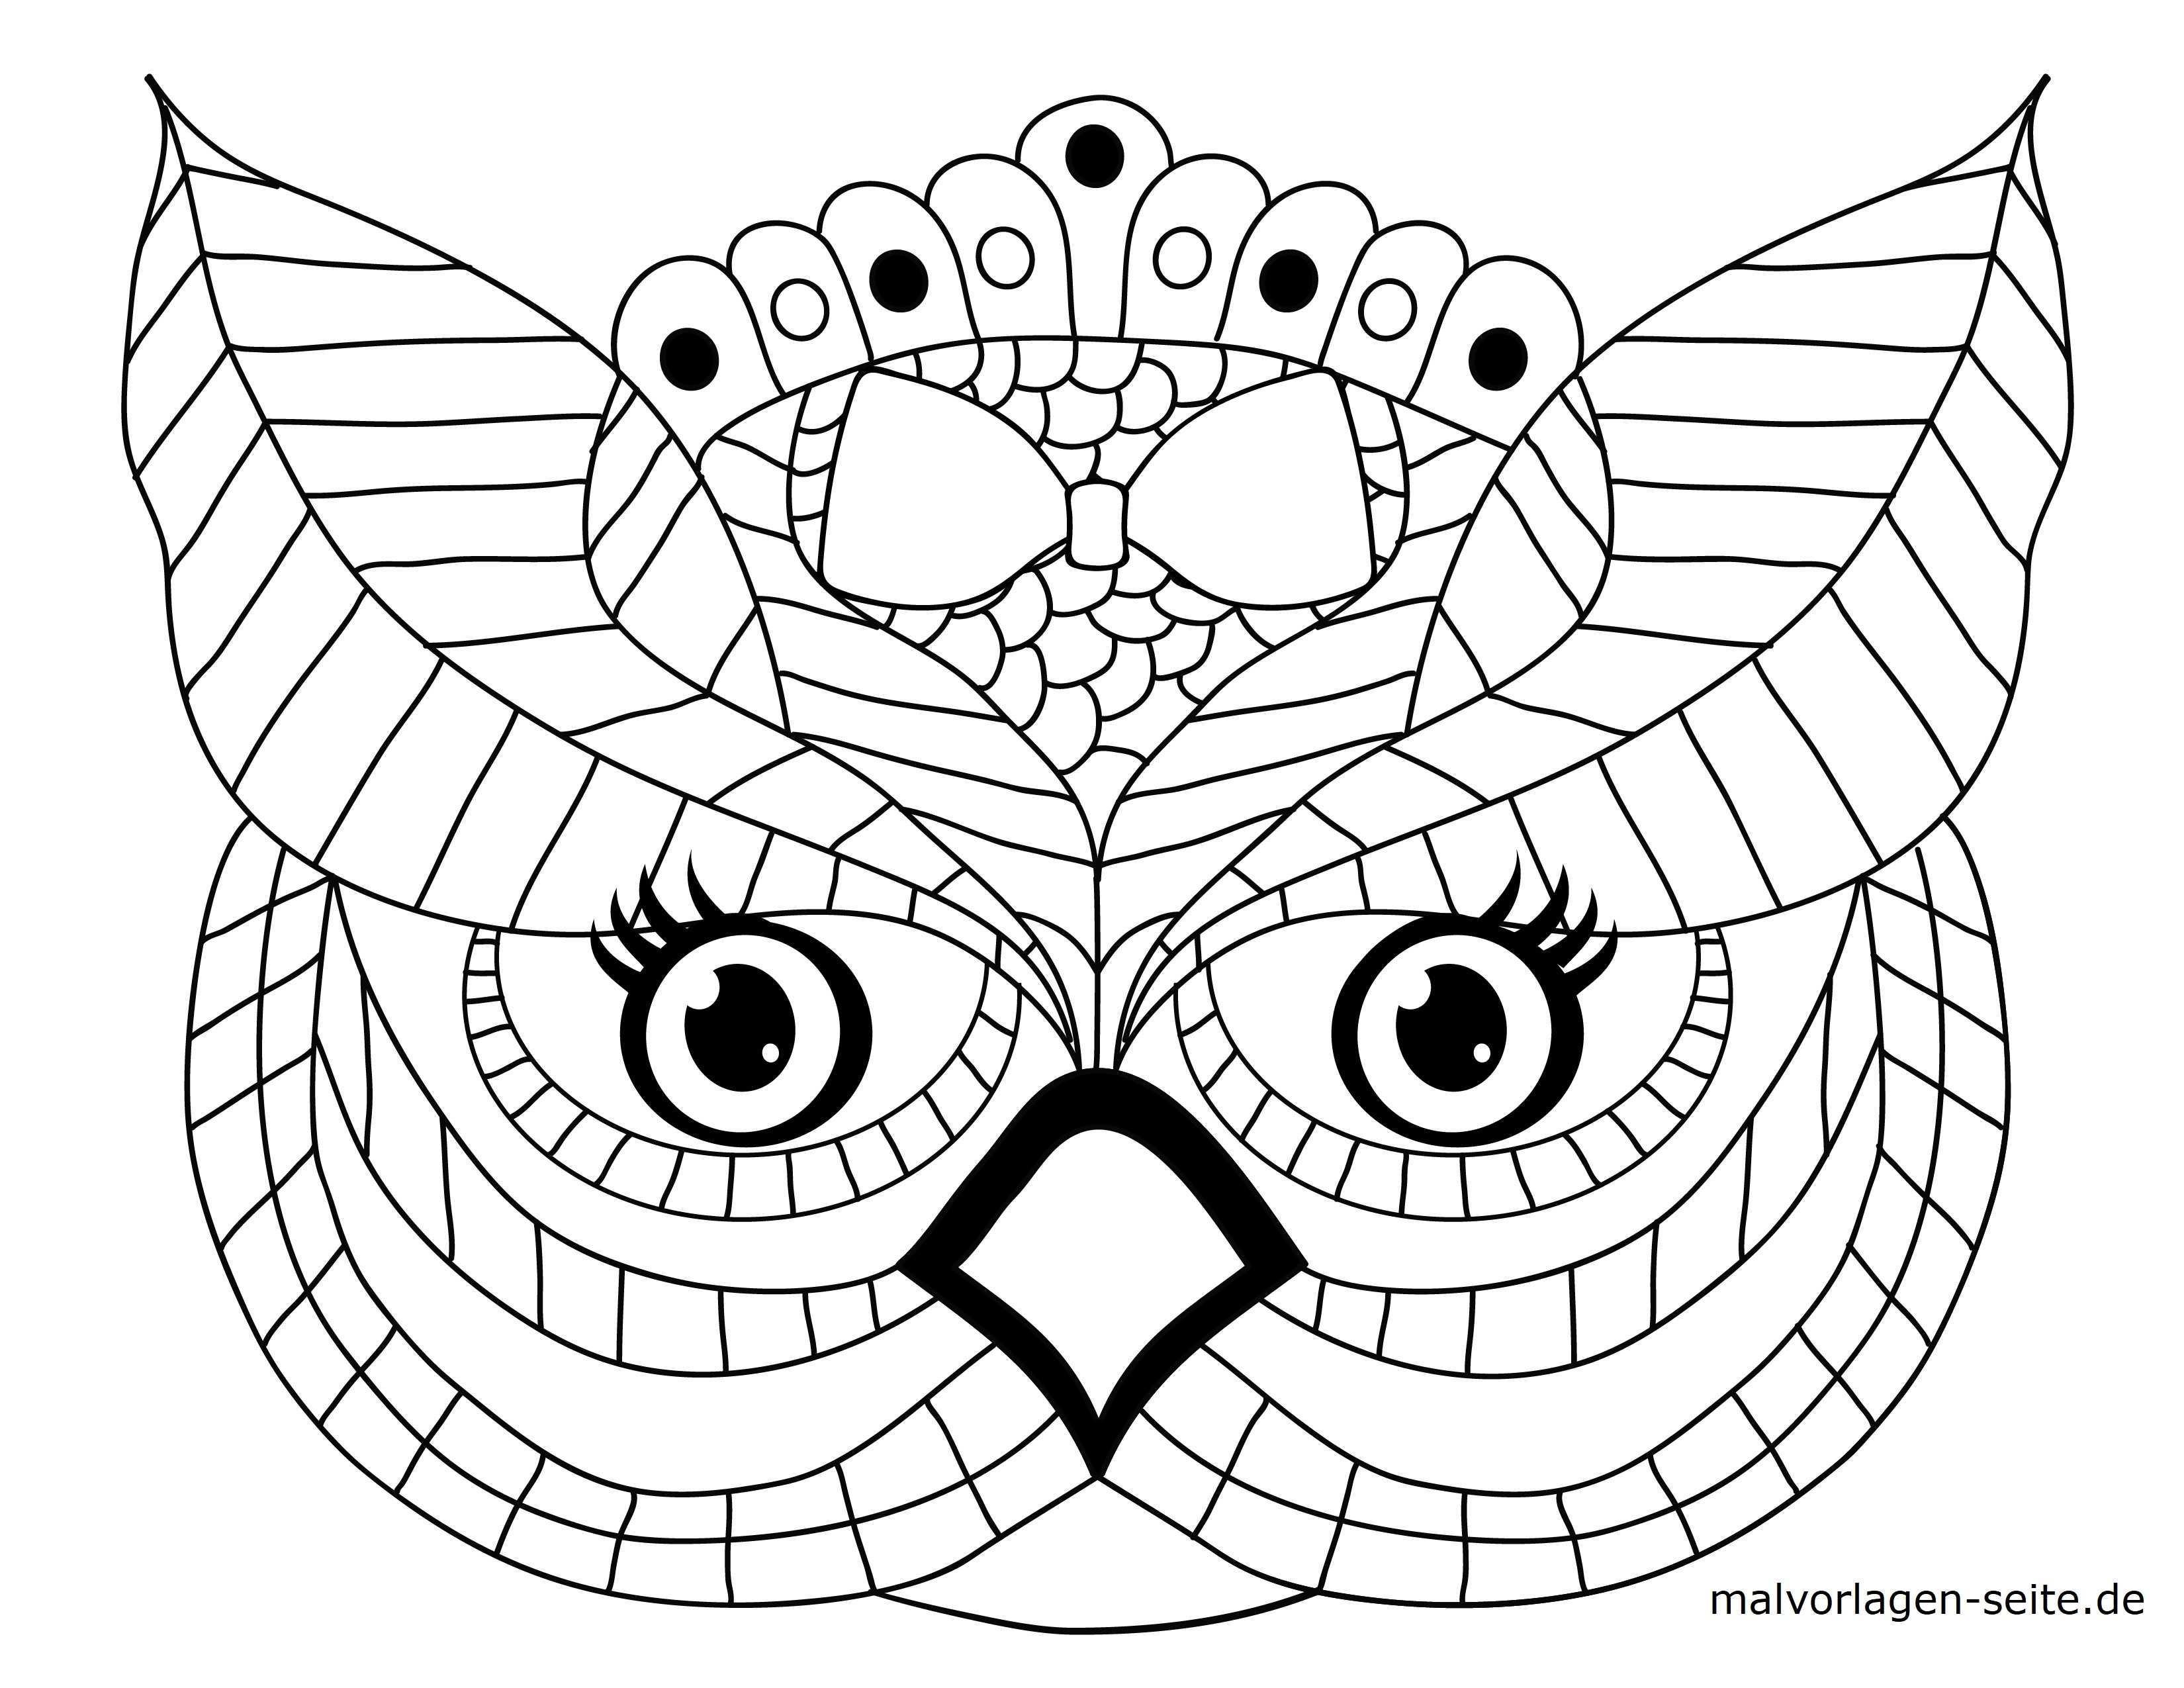 Malvorlage Tiermandala Eule Tiere Mandala Kostenlose Ausmalbilder